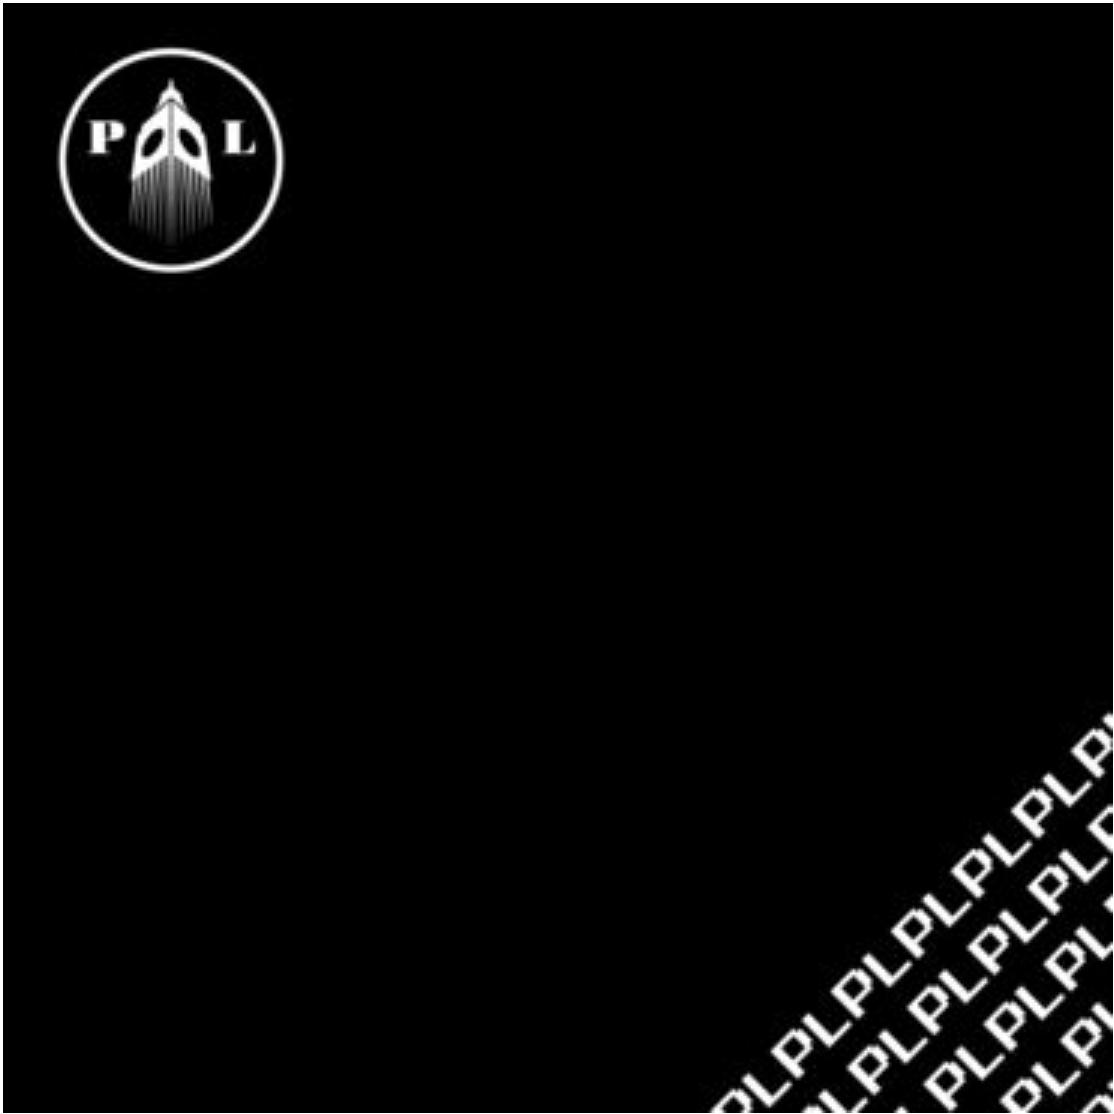 Paranoid London Records Paranoid London - PL